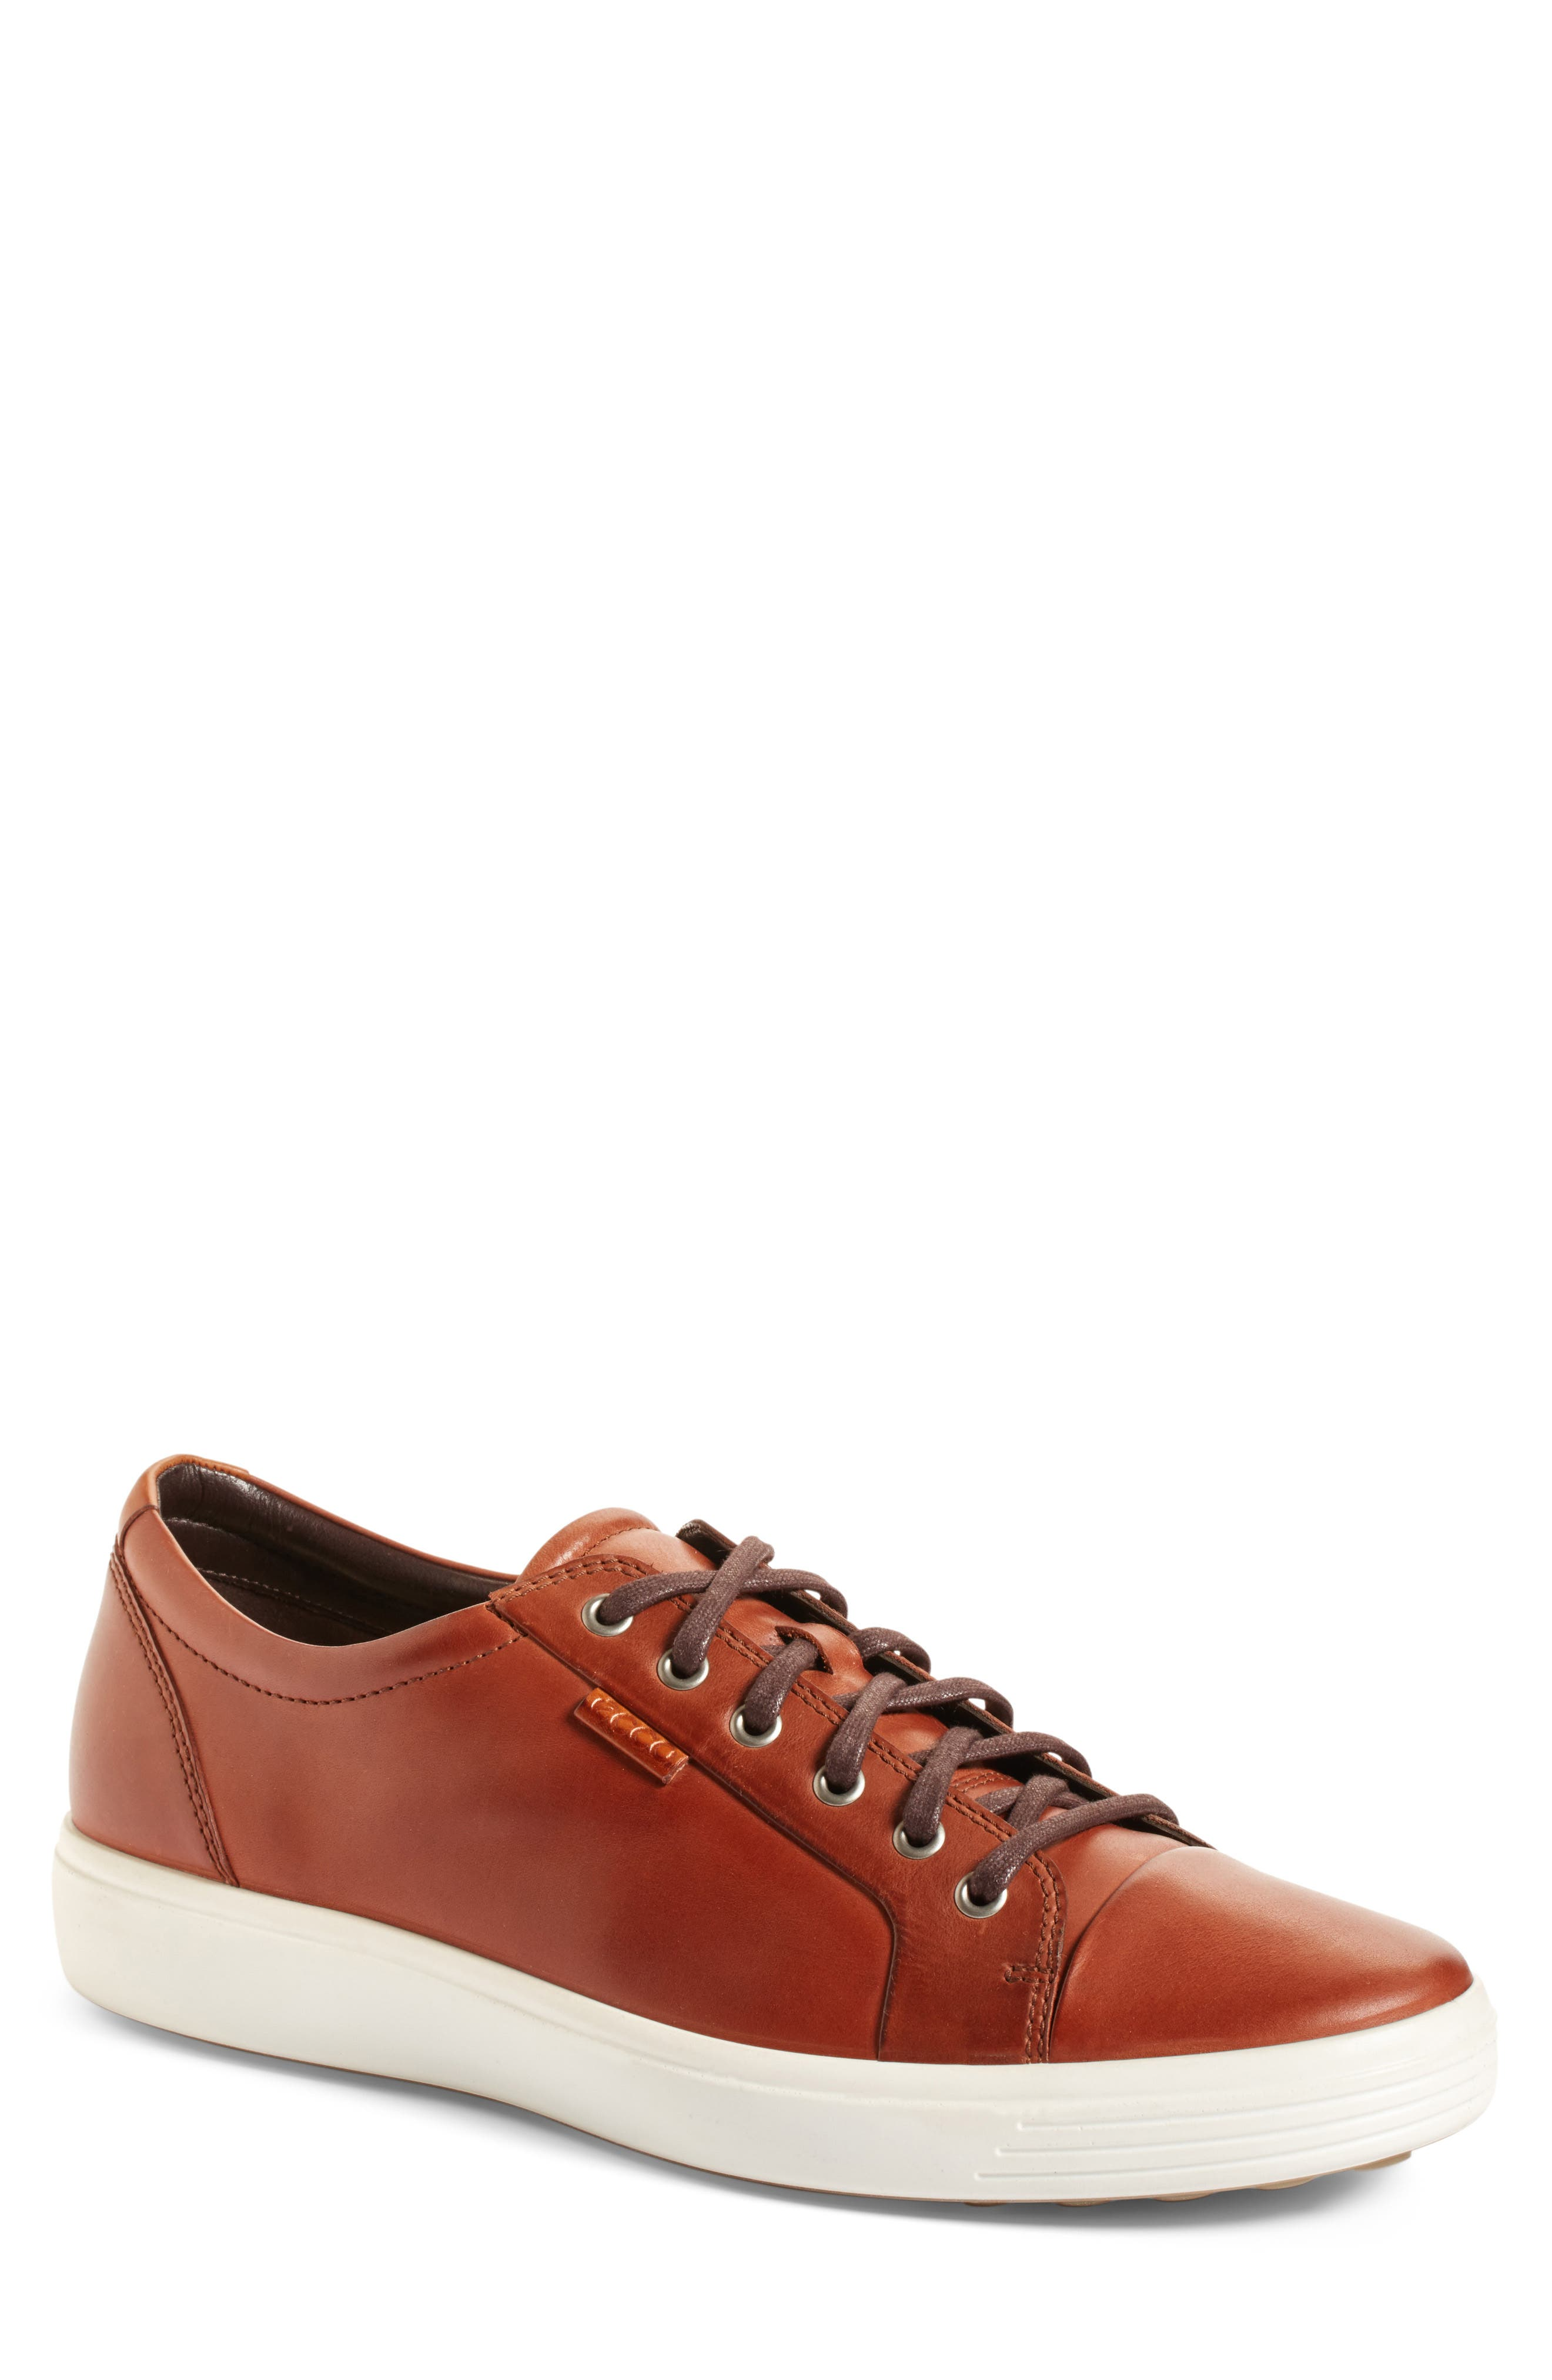 Soft VII Lace-Up Sneaker,                         Main,                         color, MAHOGANY